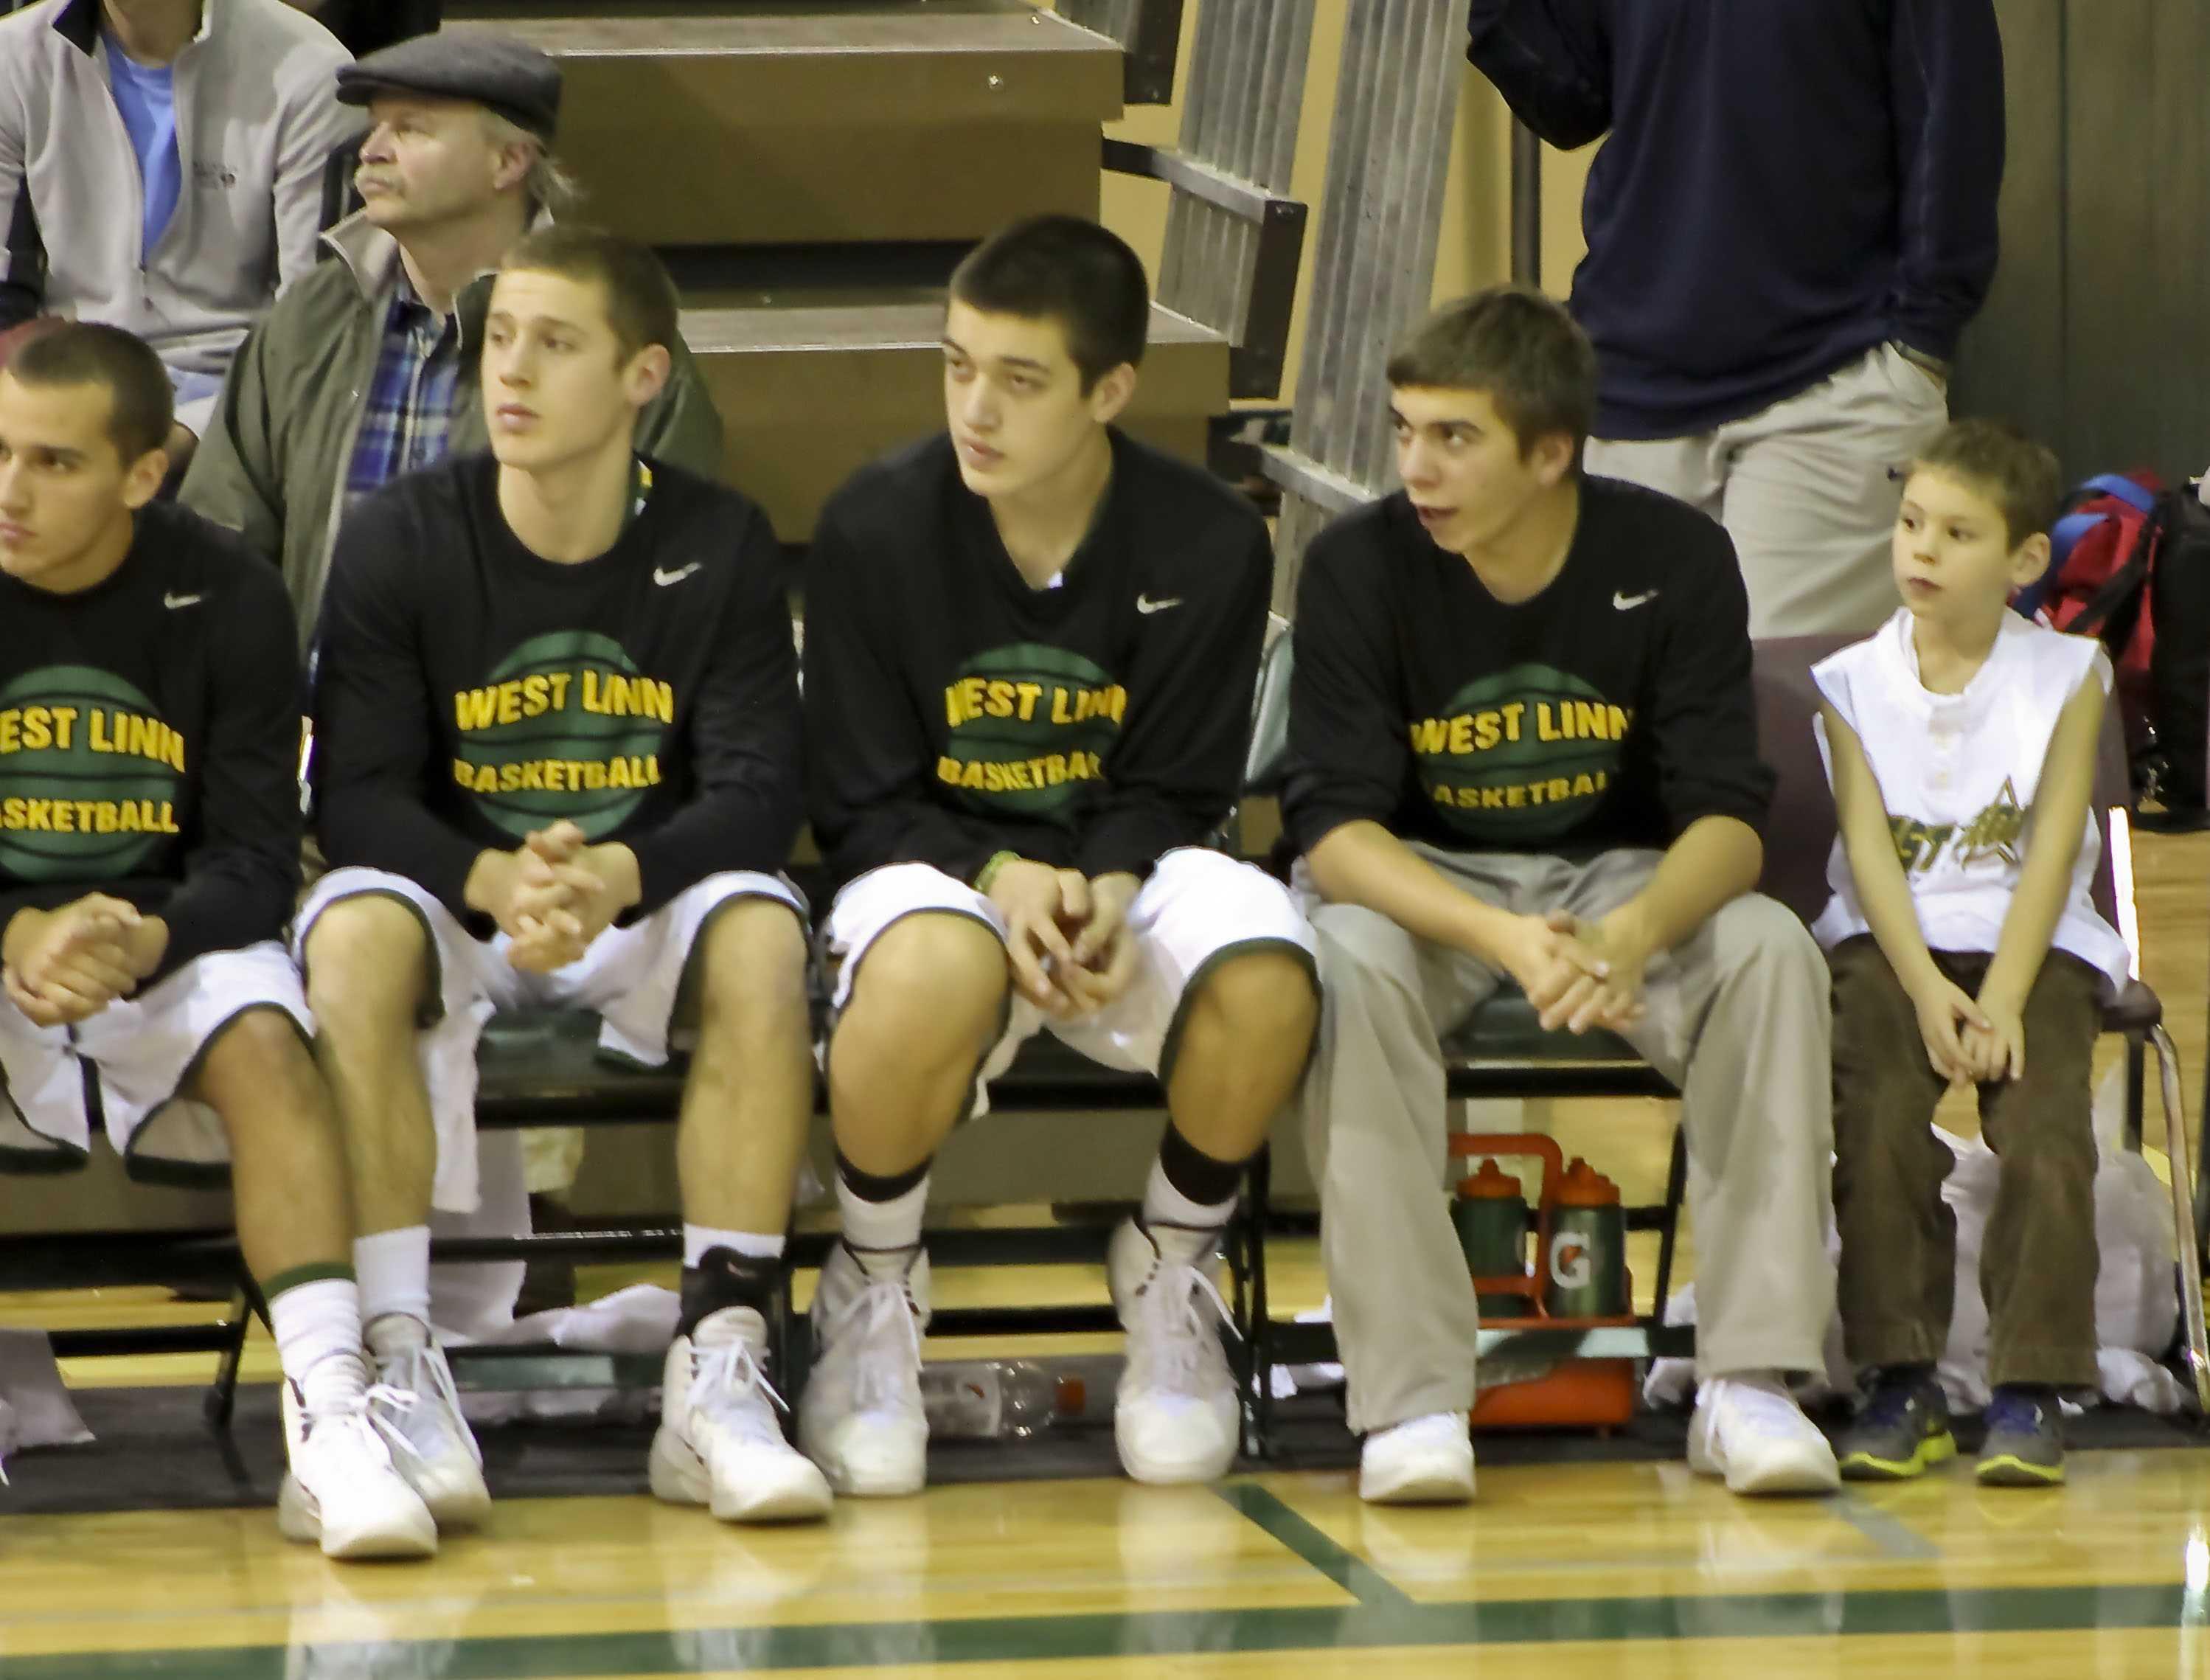 David Pulaski, junior, Matt Wright, senior, Colin Shearmire, sophomore, and  Manager Ben Baldwin, junior, watch as West Linn takes on Rival Oregon City.